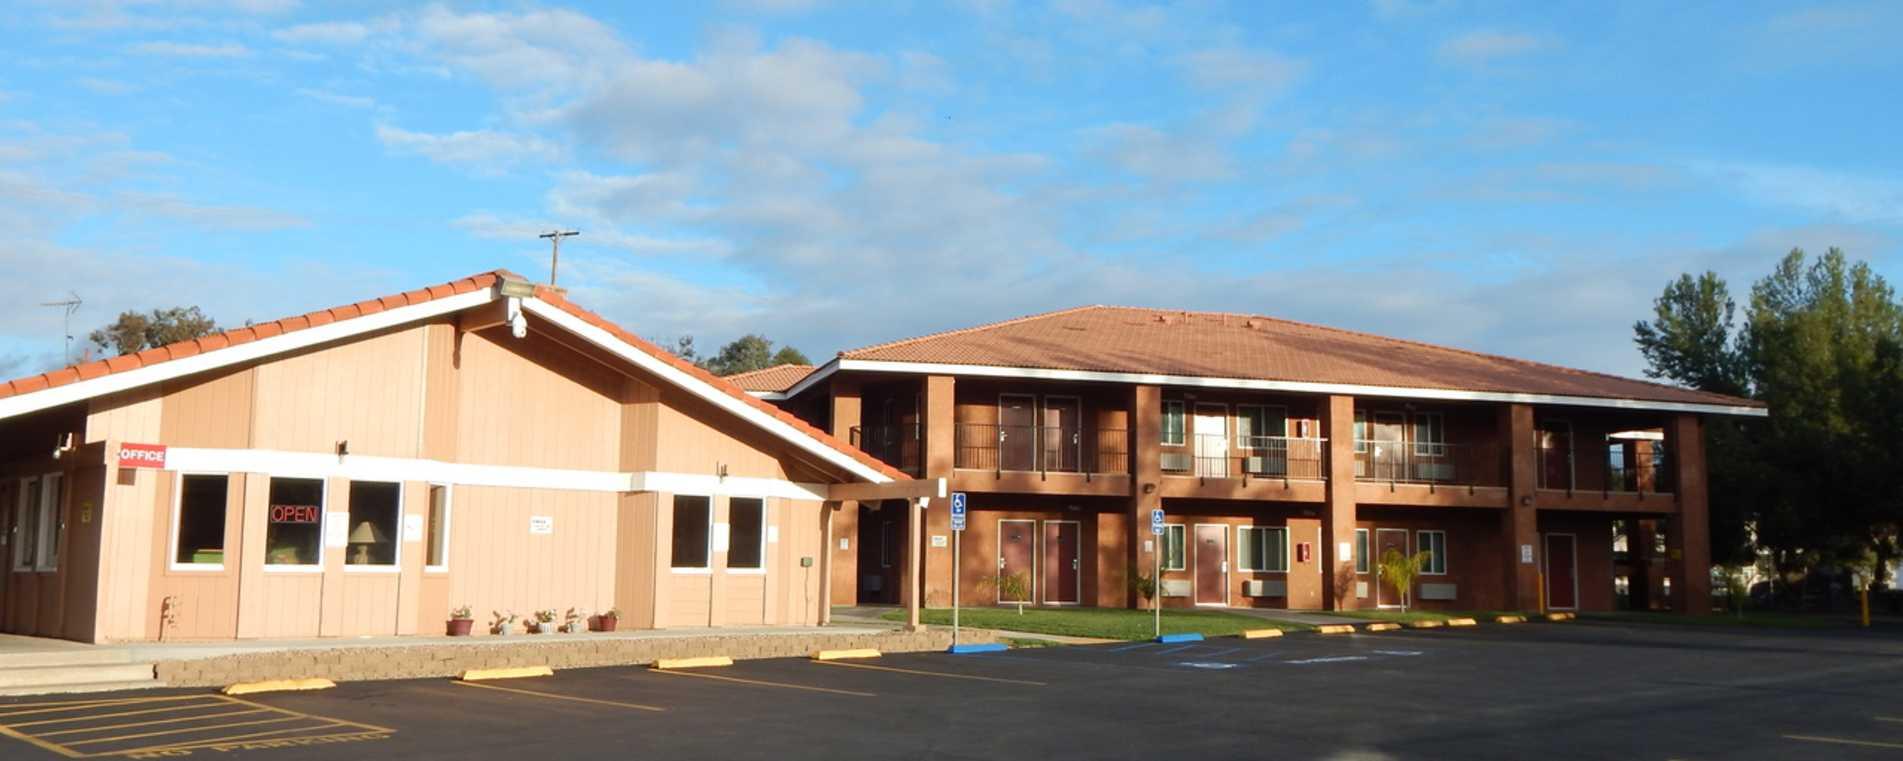 Rancho California Inn - Temecula